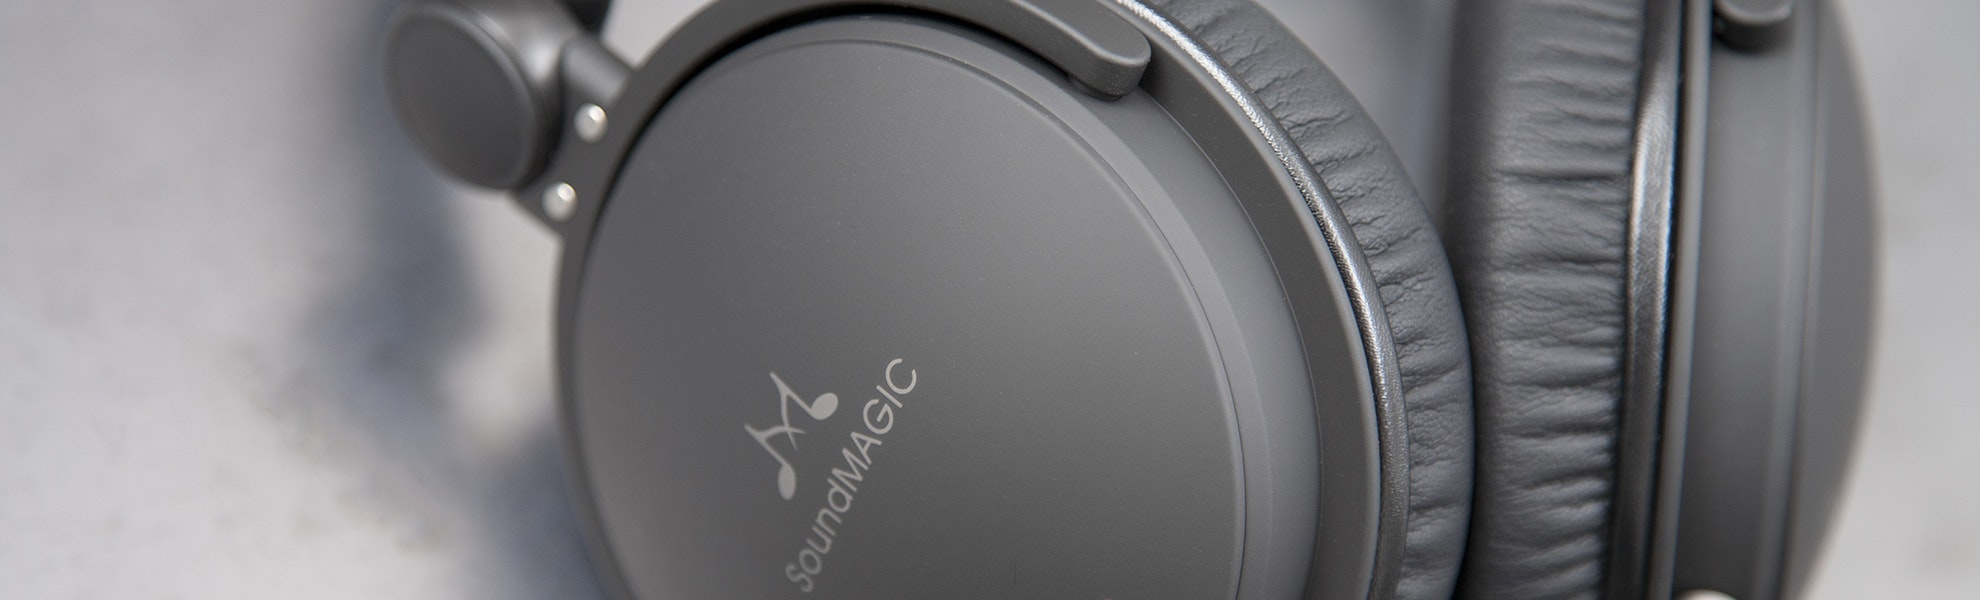 SoundMAGIC HP150 Headphones